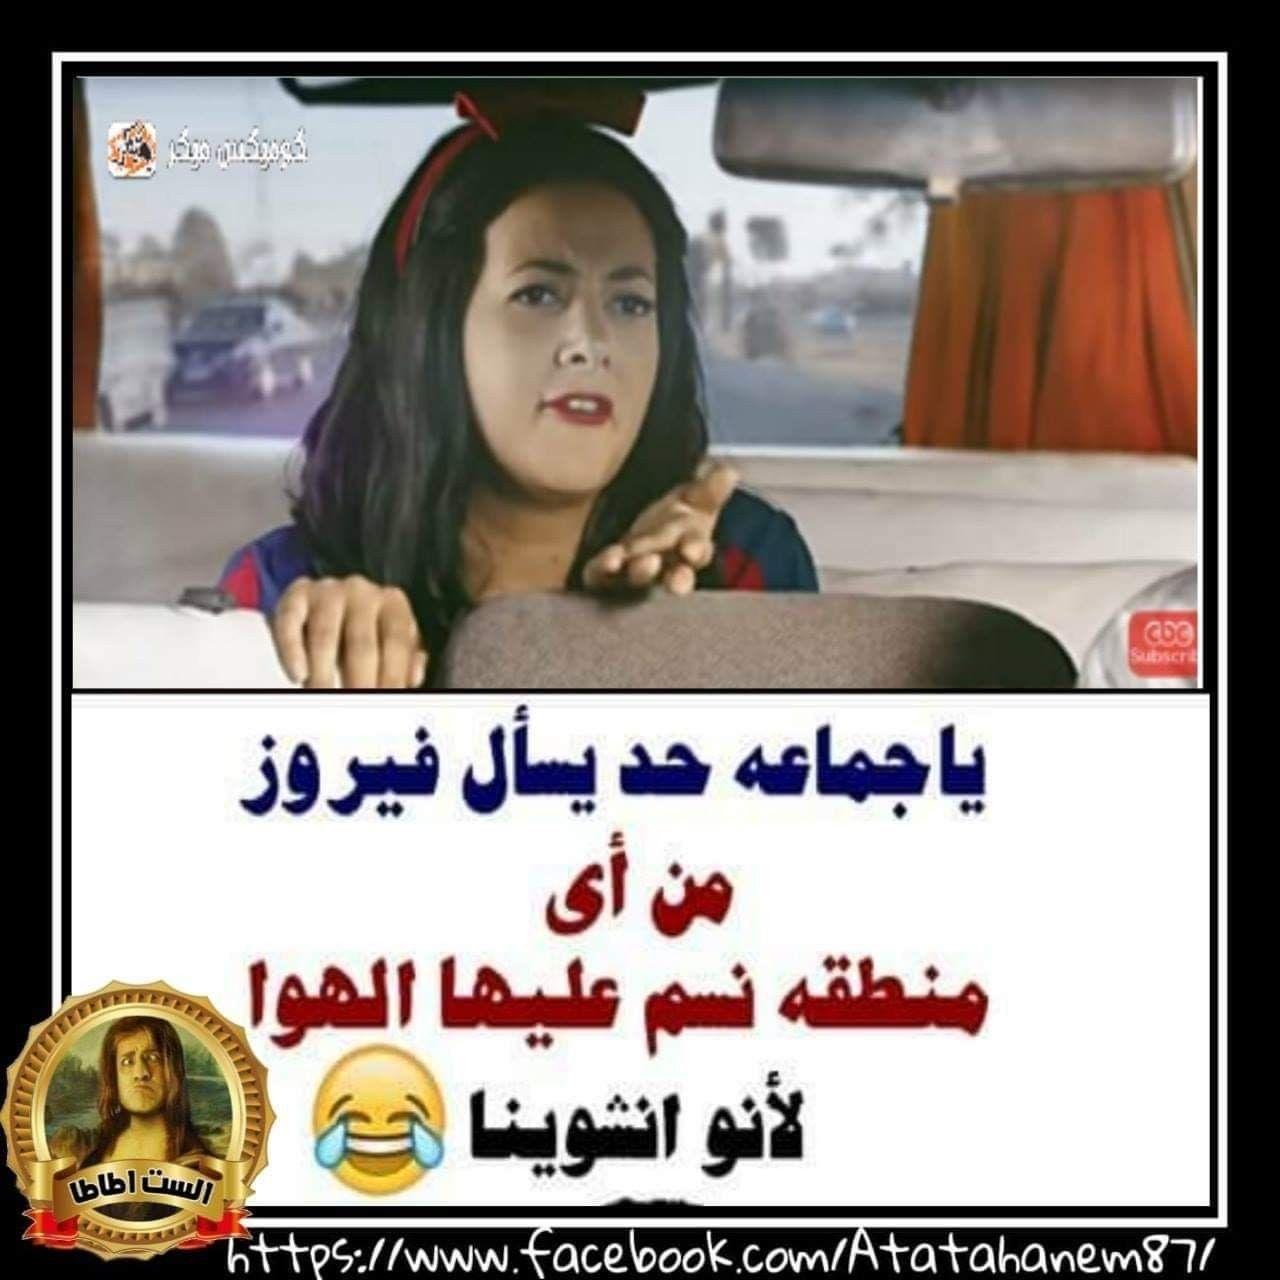 Pin By Naminas On نكت Jokes Quotes Photo Quotes Arabic Jokes